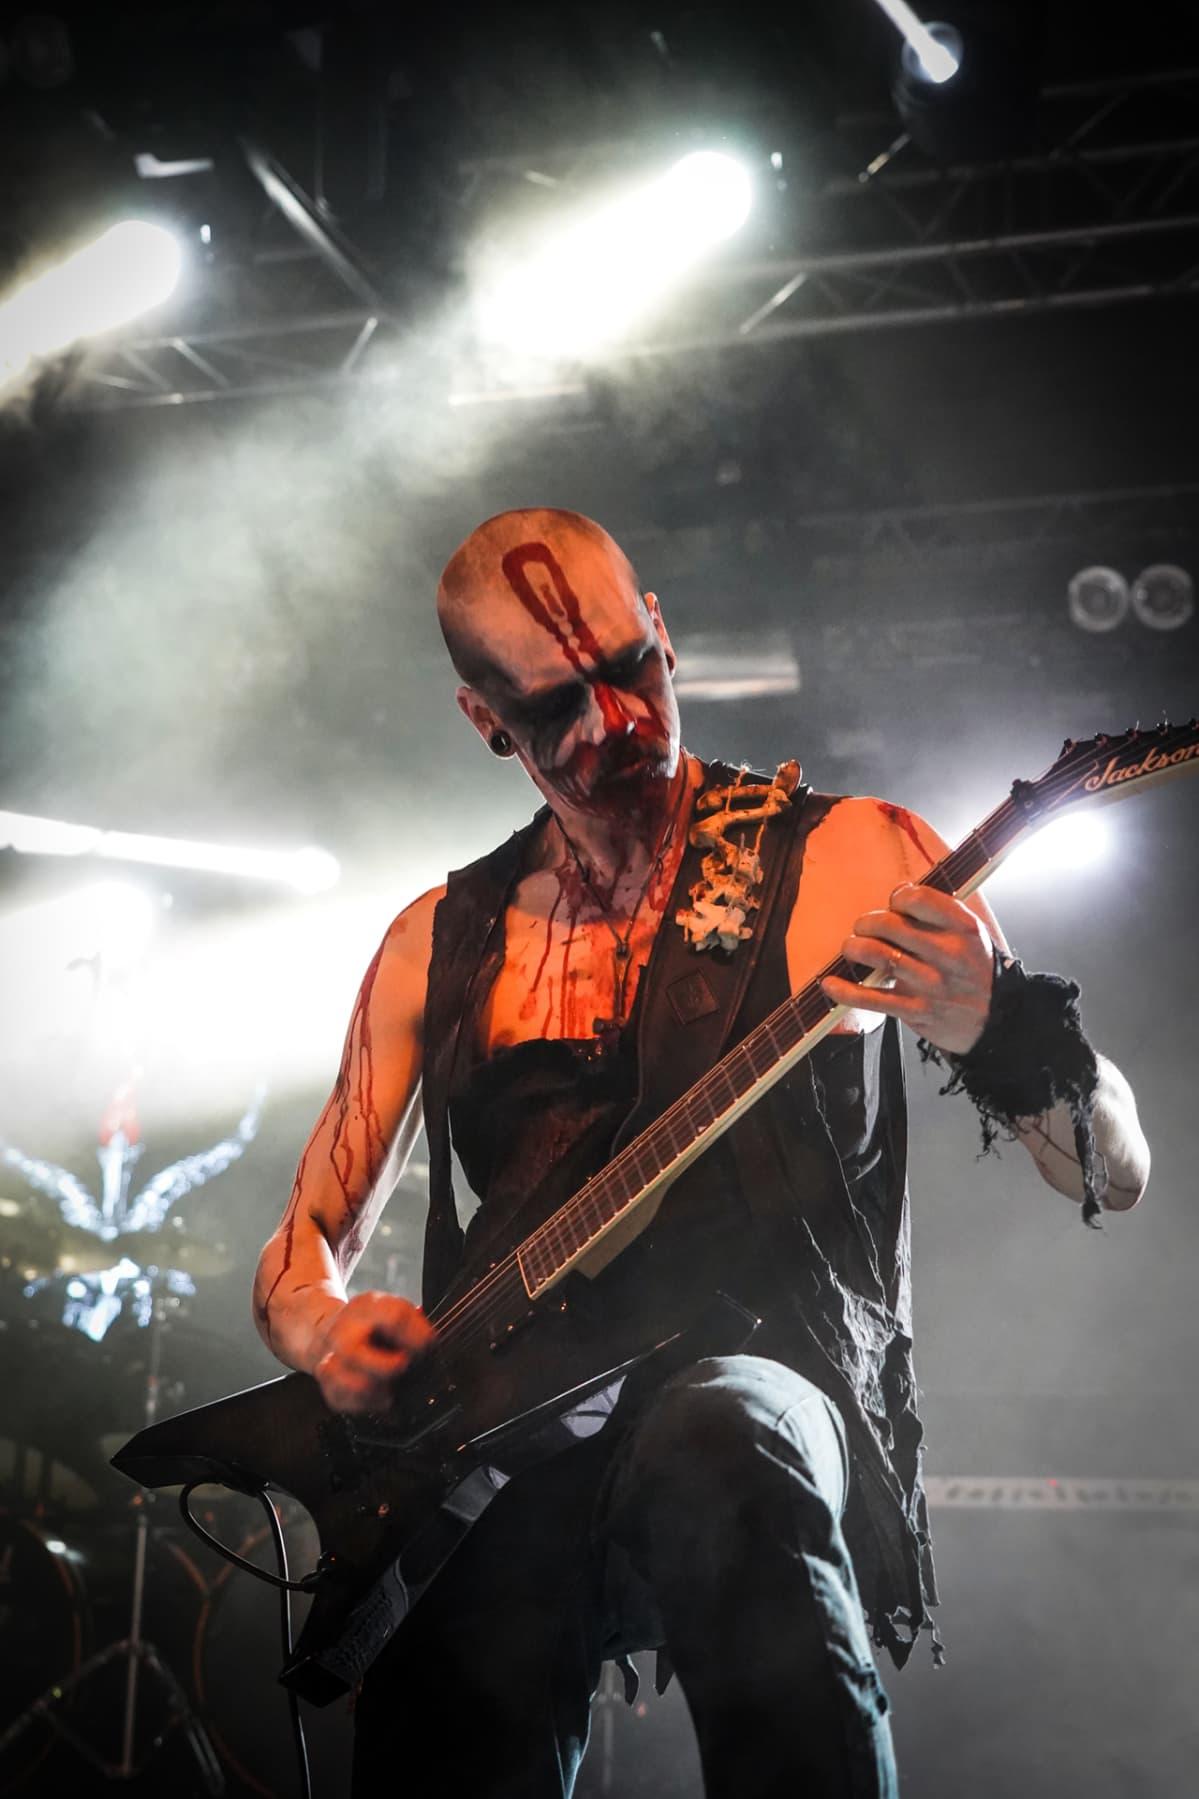 Trollheims Grott, Steelfest, black metal